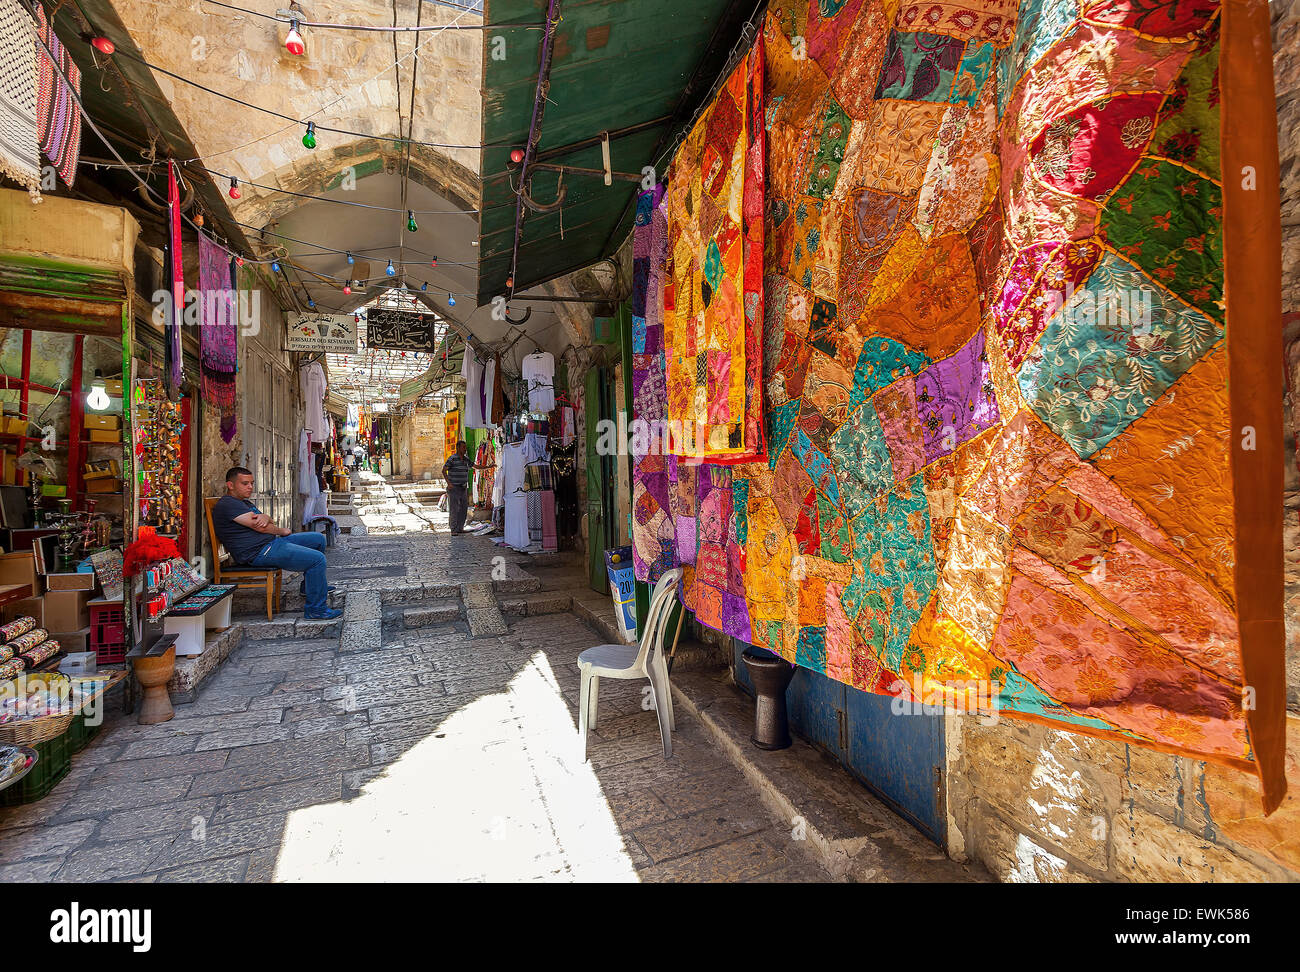 Traditional colorful carpets on bazaar in Jerusalem, Israel. - Stock Image